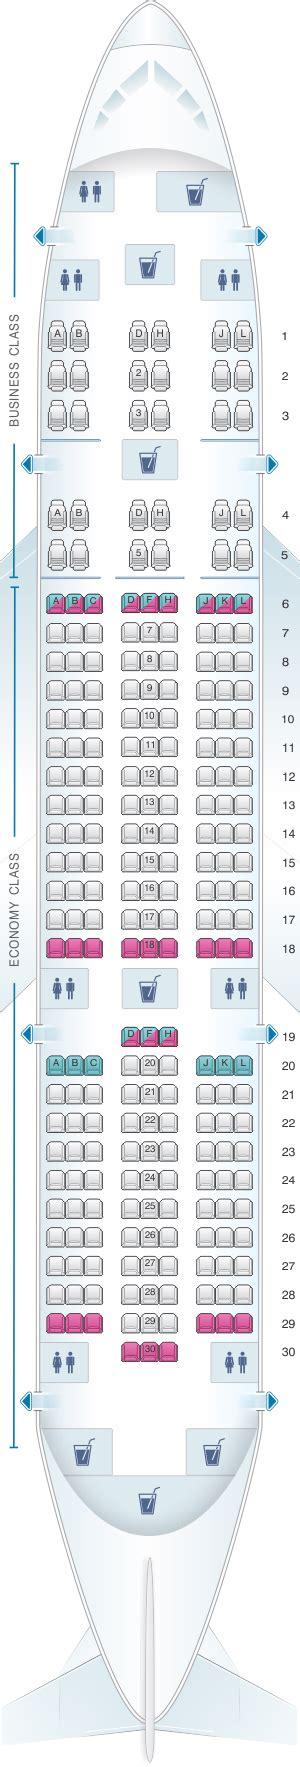 lan chile seat selection mapa de asientos latam airlines boeing b787 dreamliner